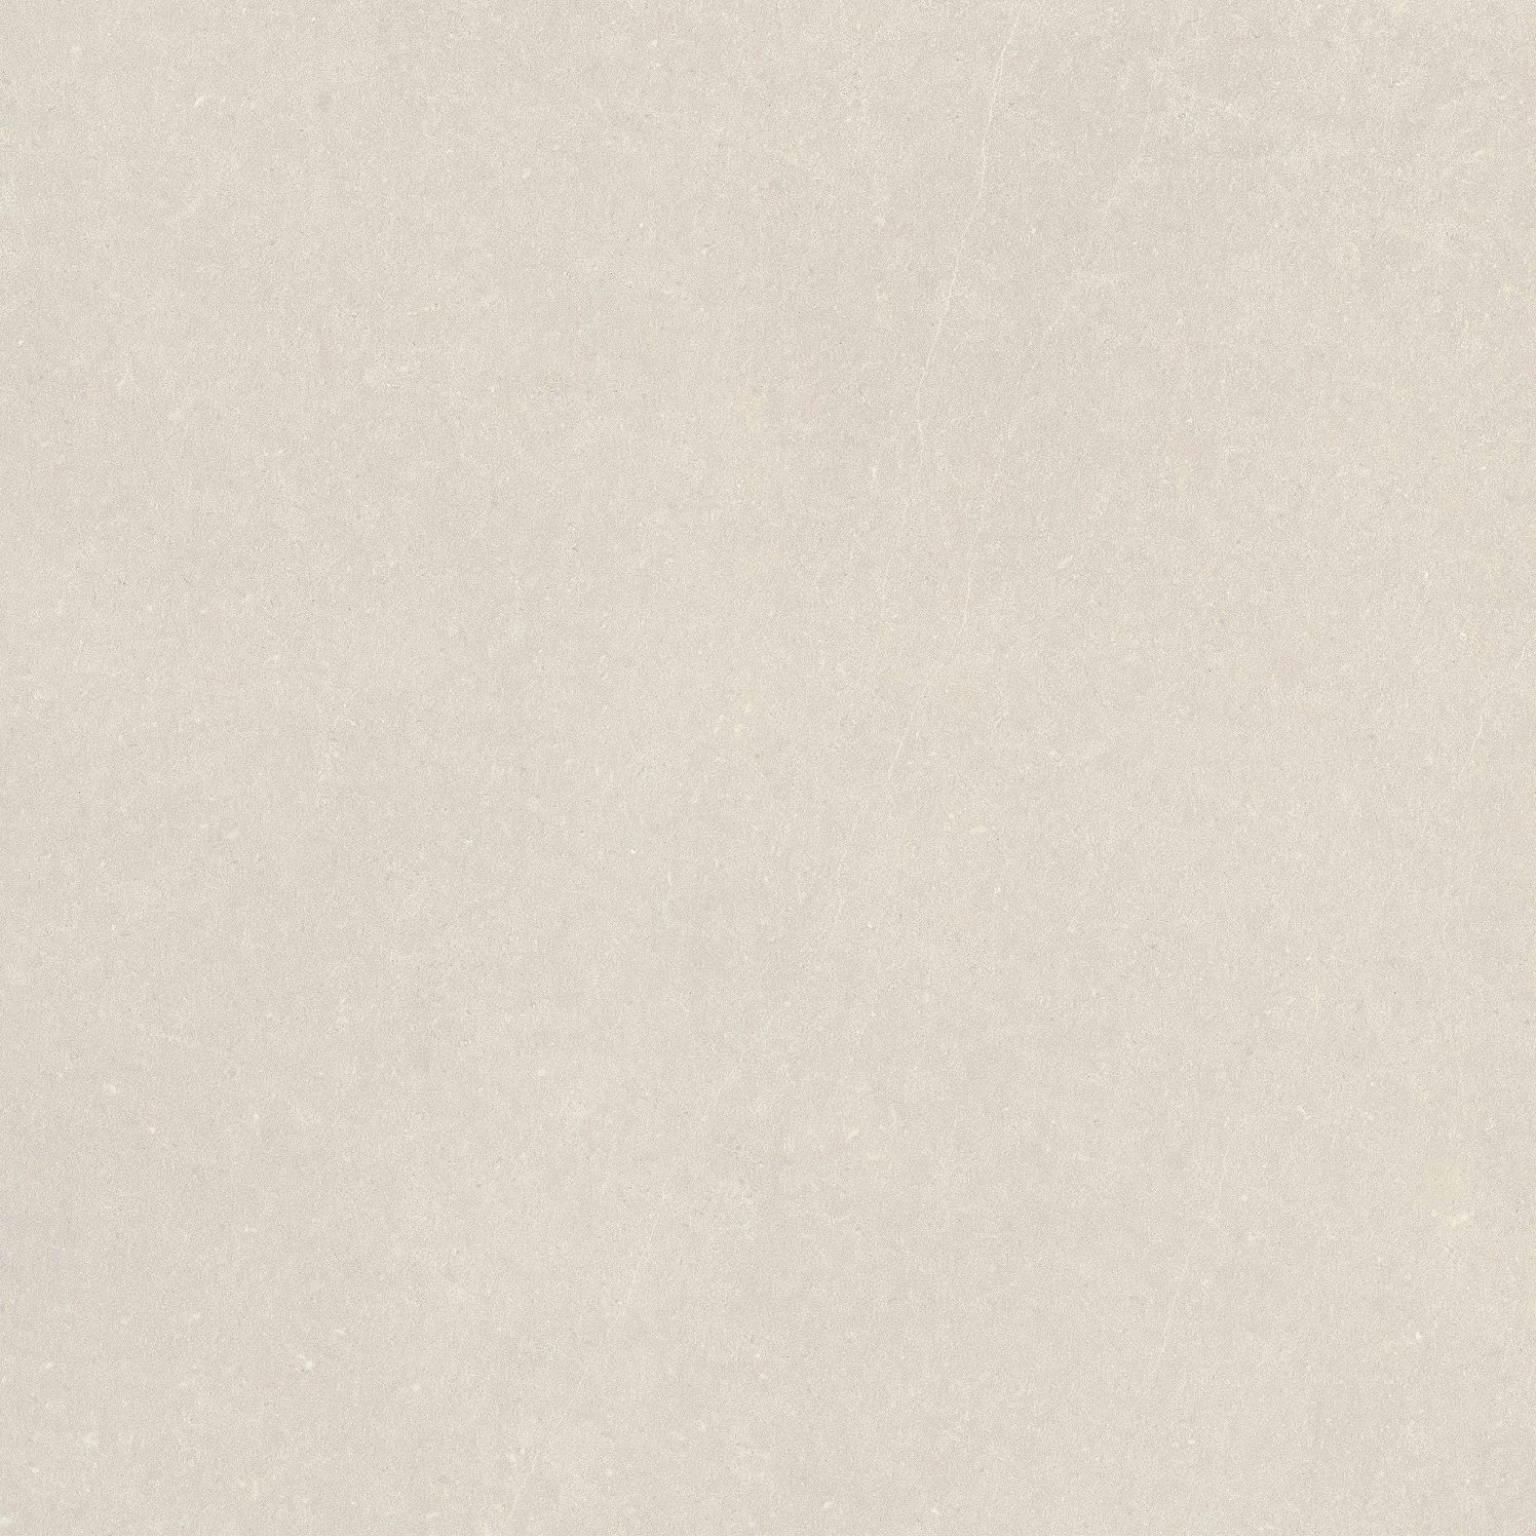 Qstone Lappato Ivory 90x90 | Newker